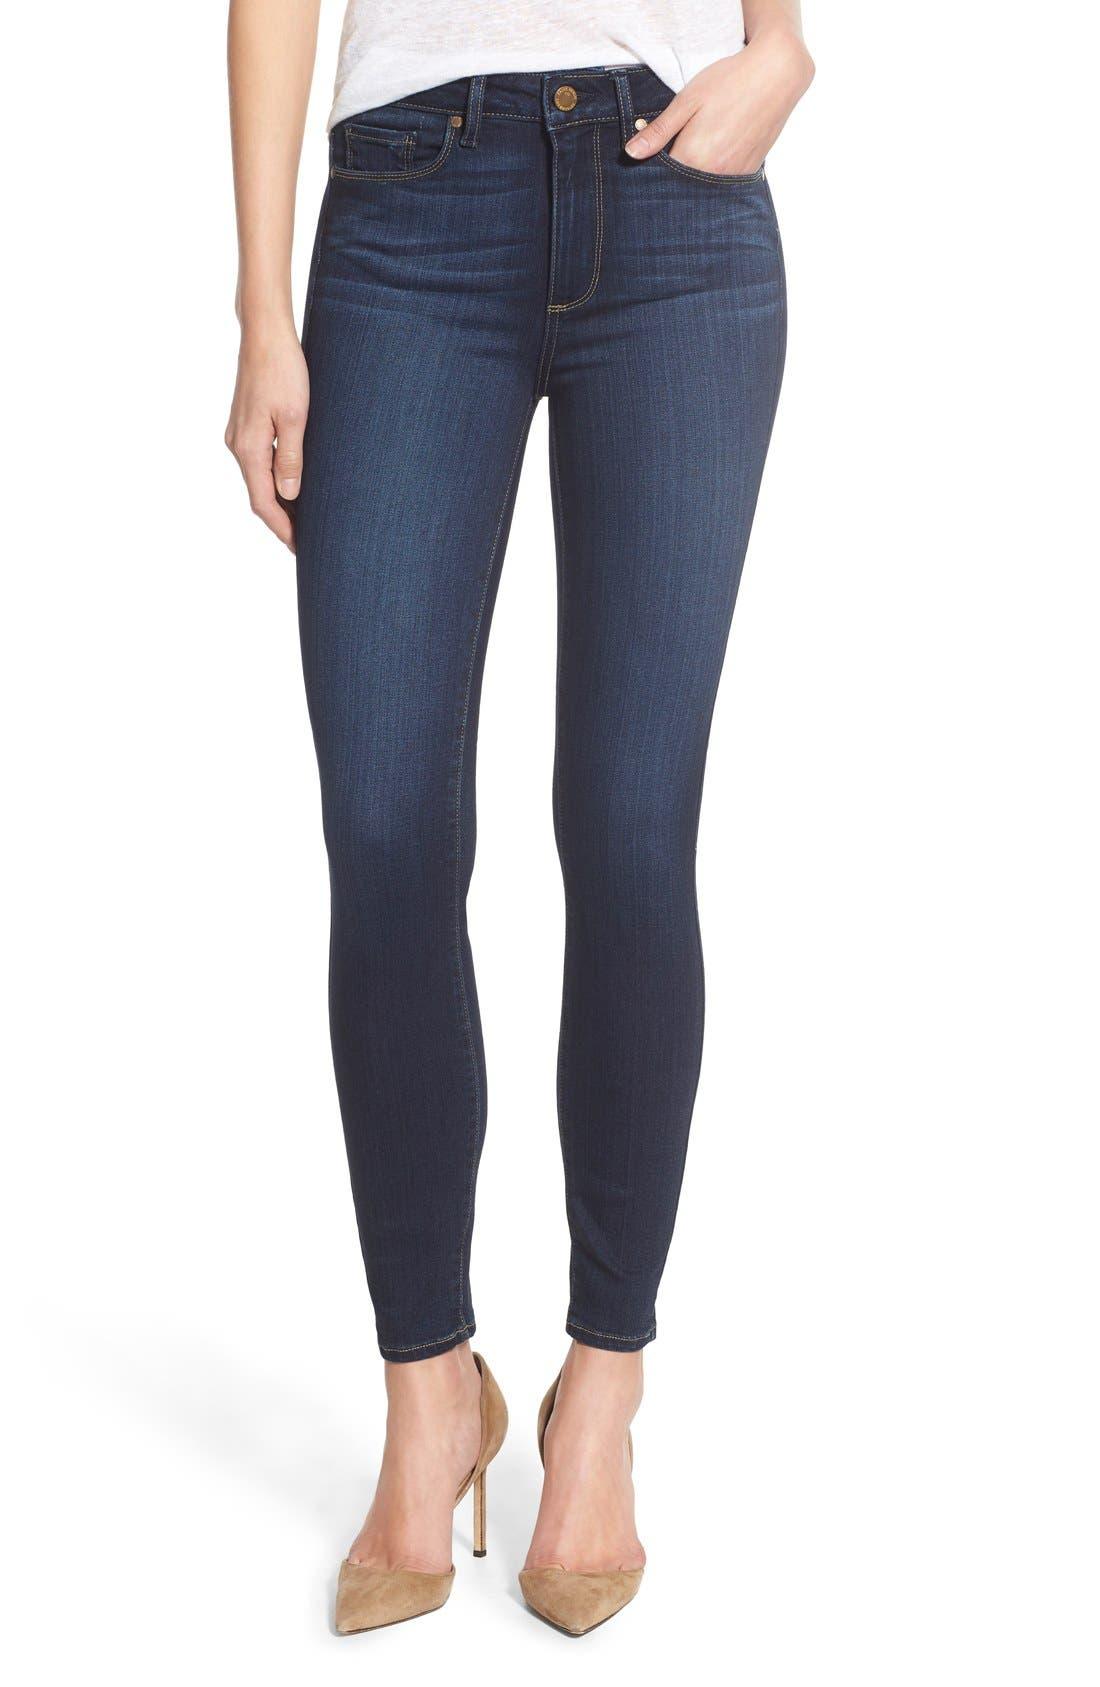 Transcend - Hoxton High Waist Ankle Ultra Skinny Jeans,                             Main thumbnail 1, color,                             HARTMANN